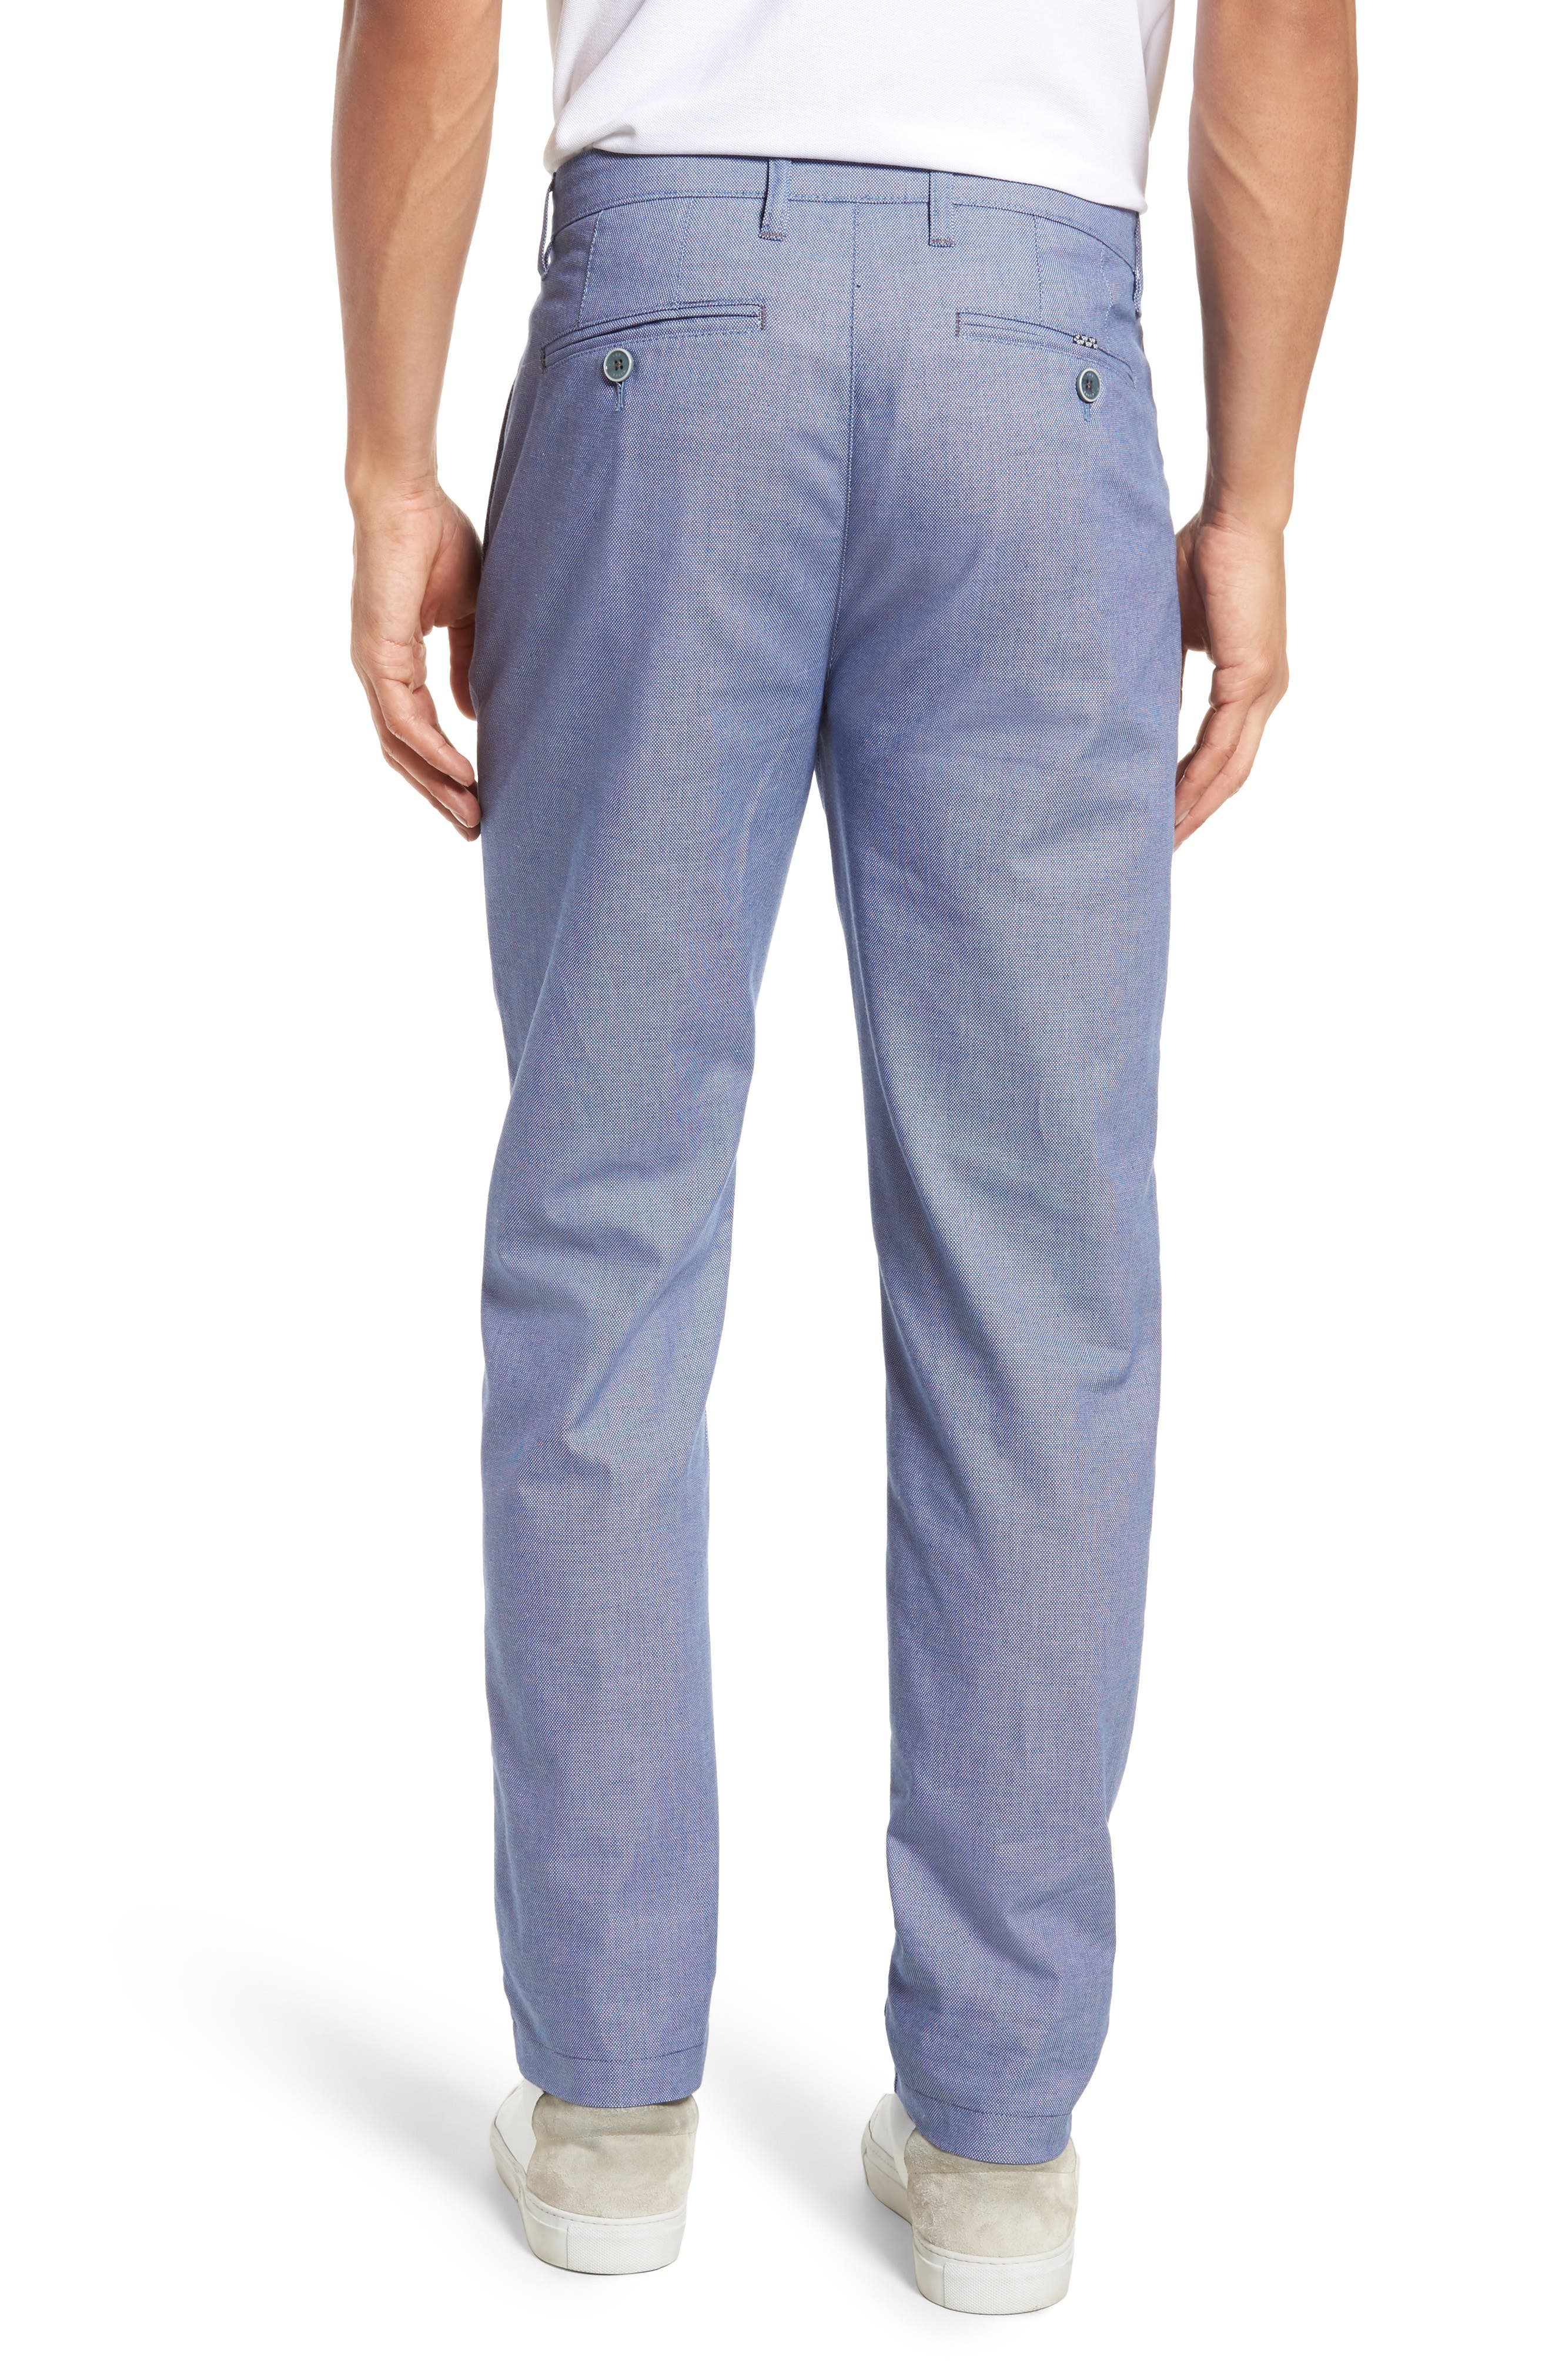 Holldet Flat Front Stretch Solid Cotton Pants,                             Alternate thumbnail 2, color,                             Light Blue